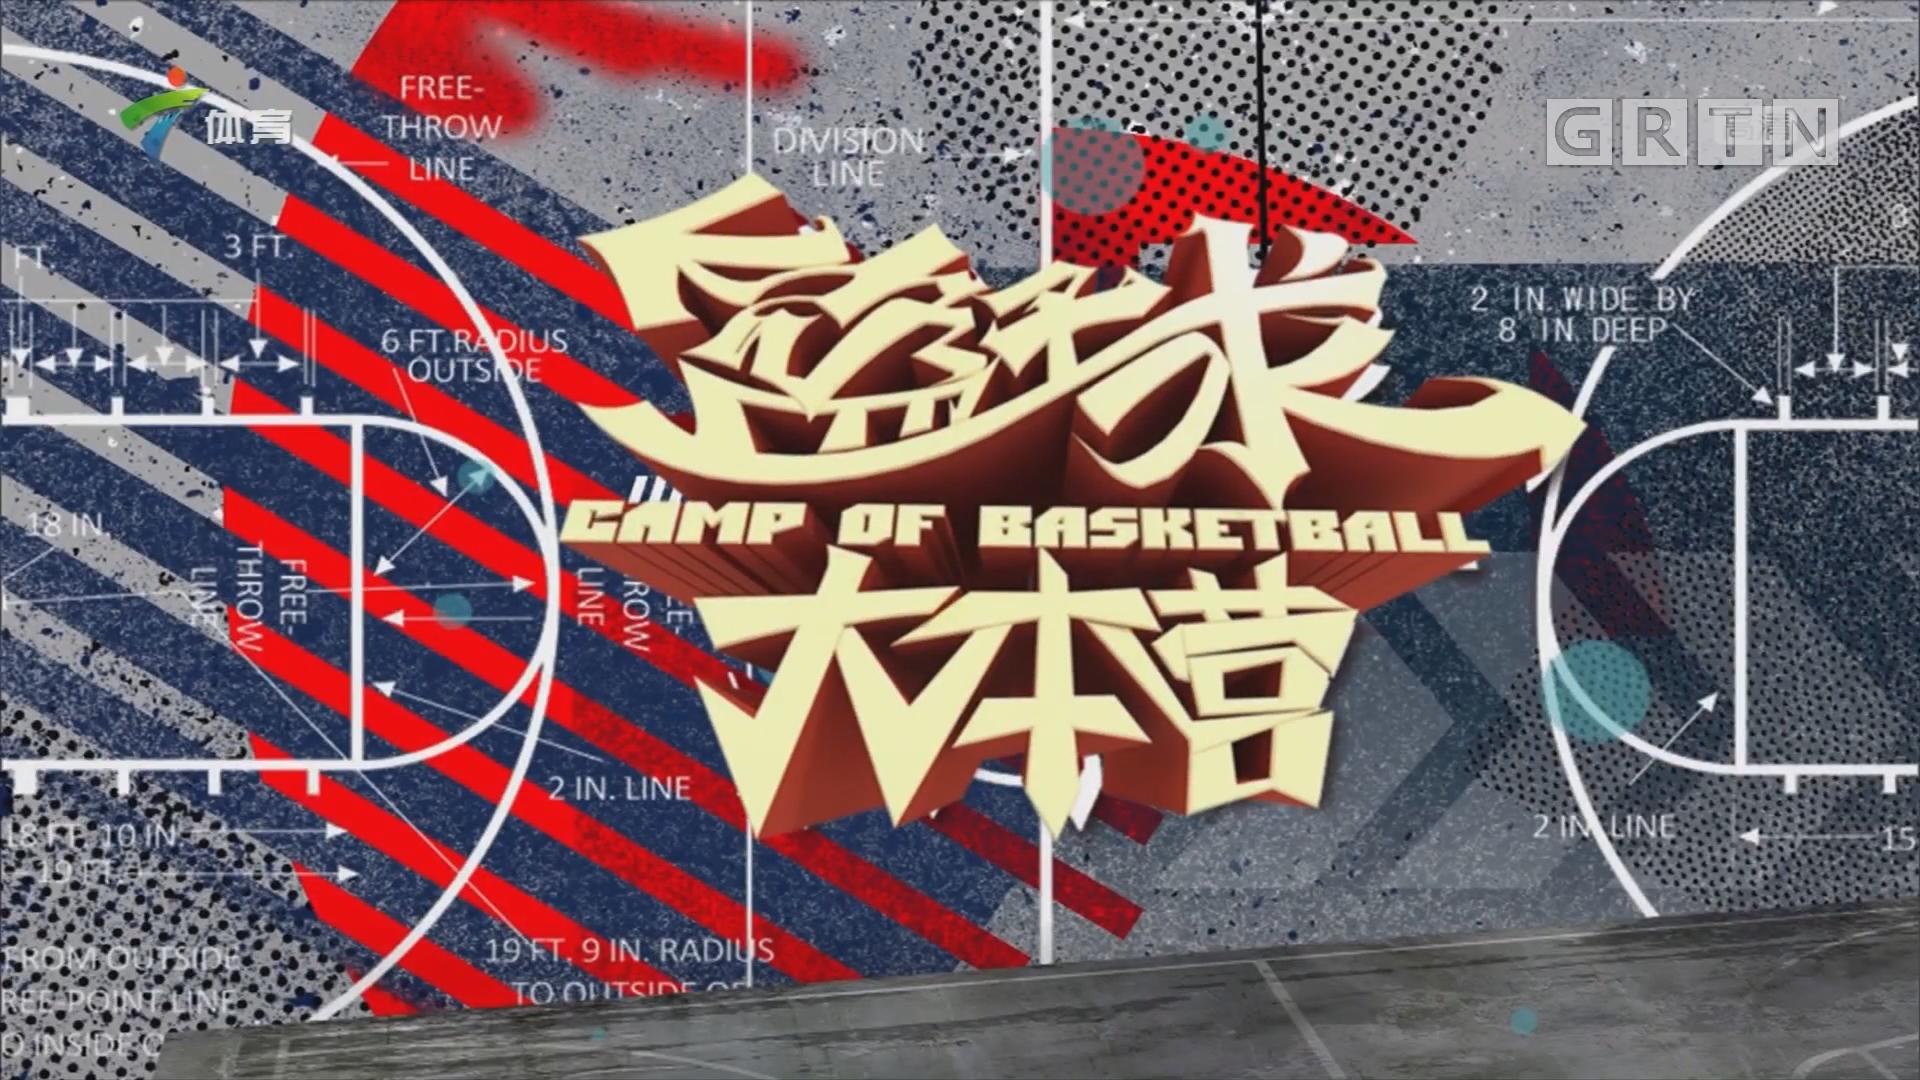 [HD][2018-09-28]篮球大本营:阿联回归 热身赛广东宏远不敌浙江广夏